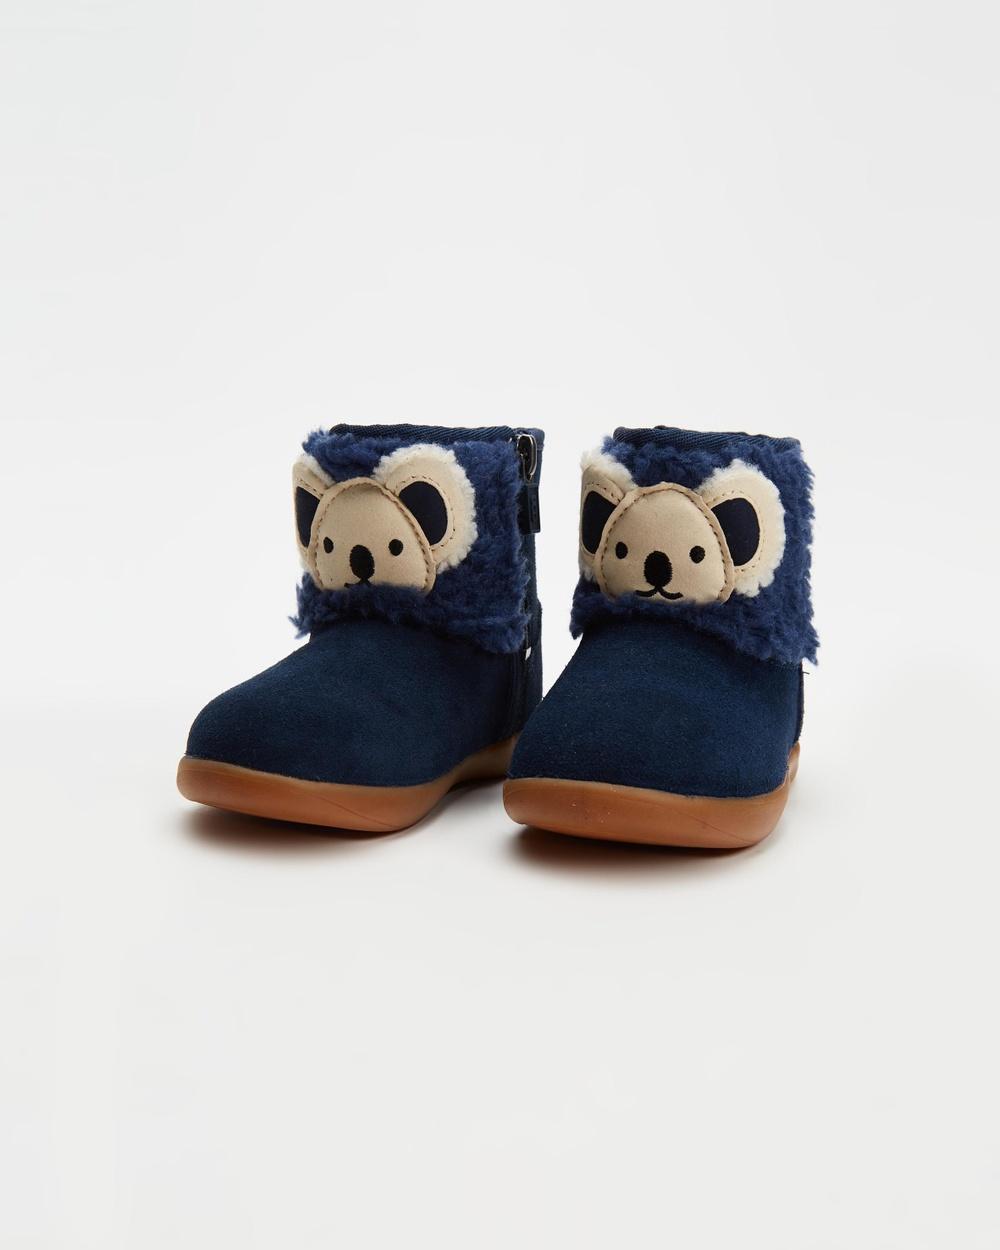 UGG Koala Stuffie Boots Babies Kids Slippers & Accessories Navy Suede Babies-Kids